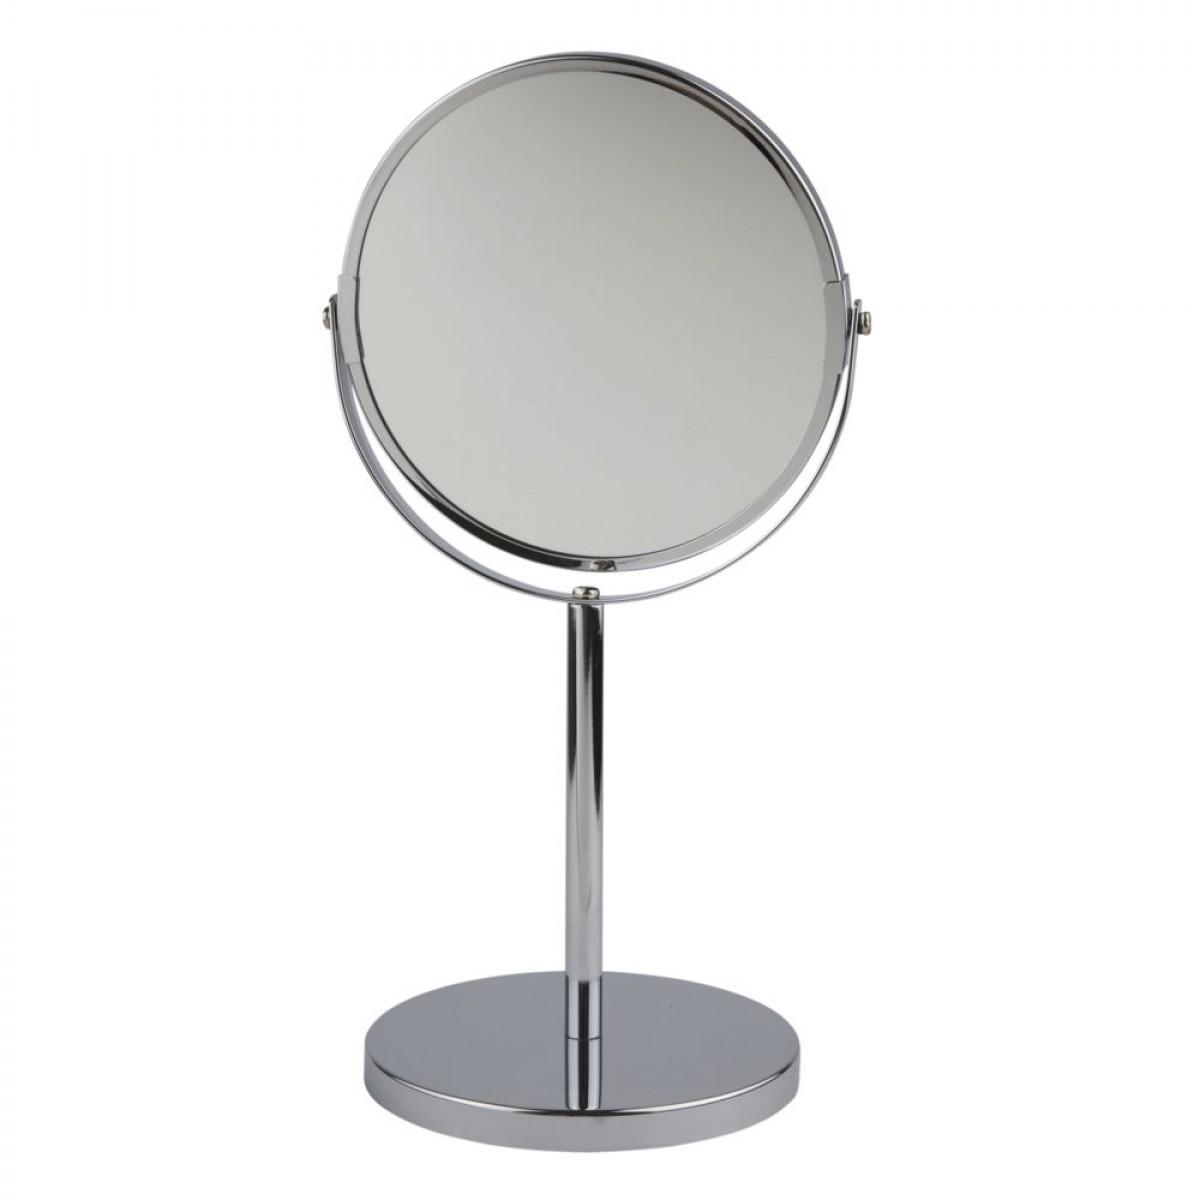 Bordspejl stål 15 cm Ø